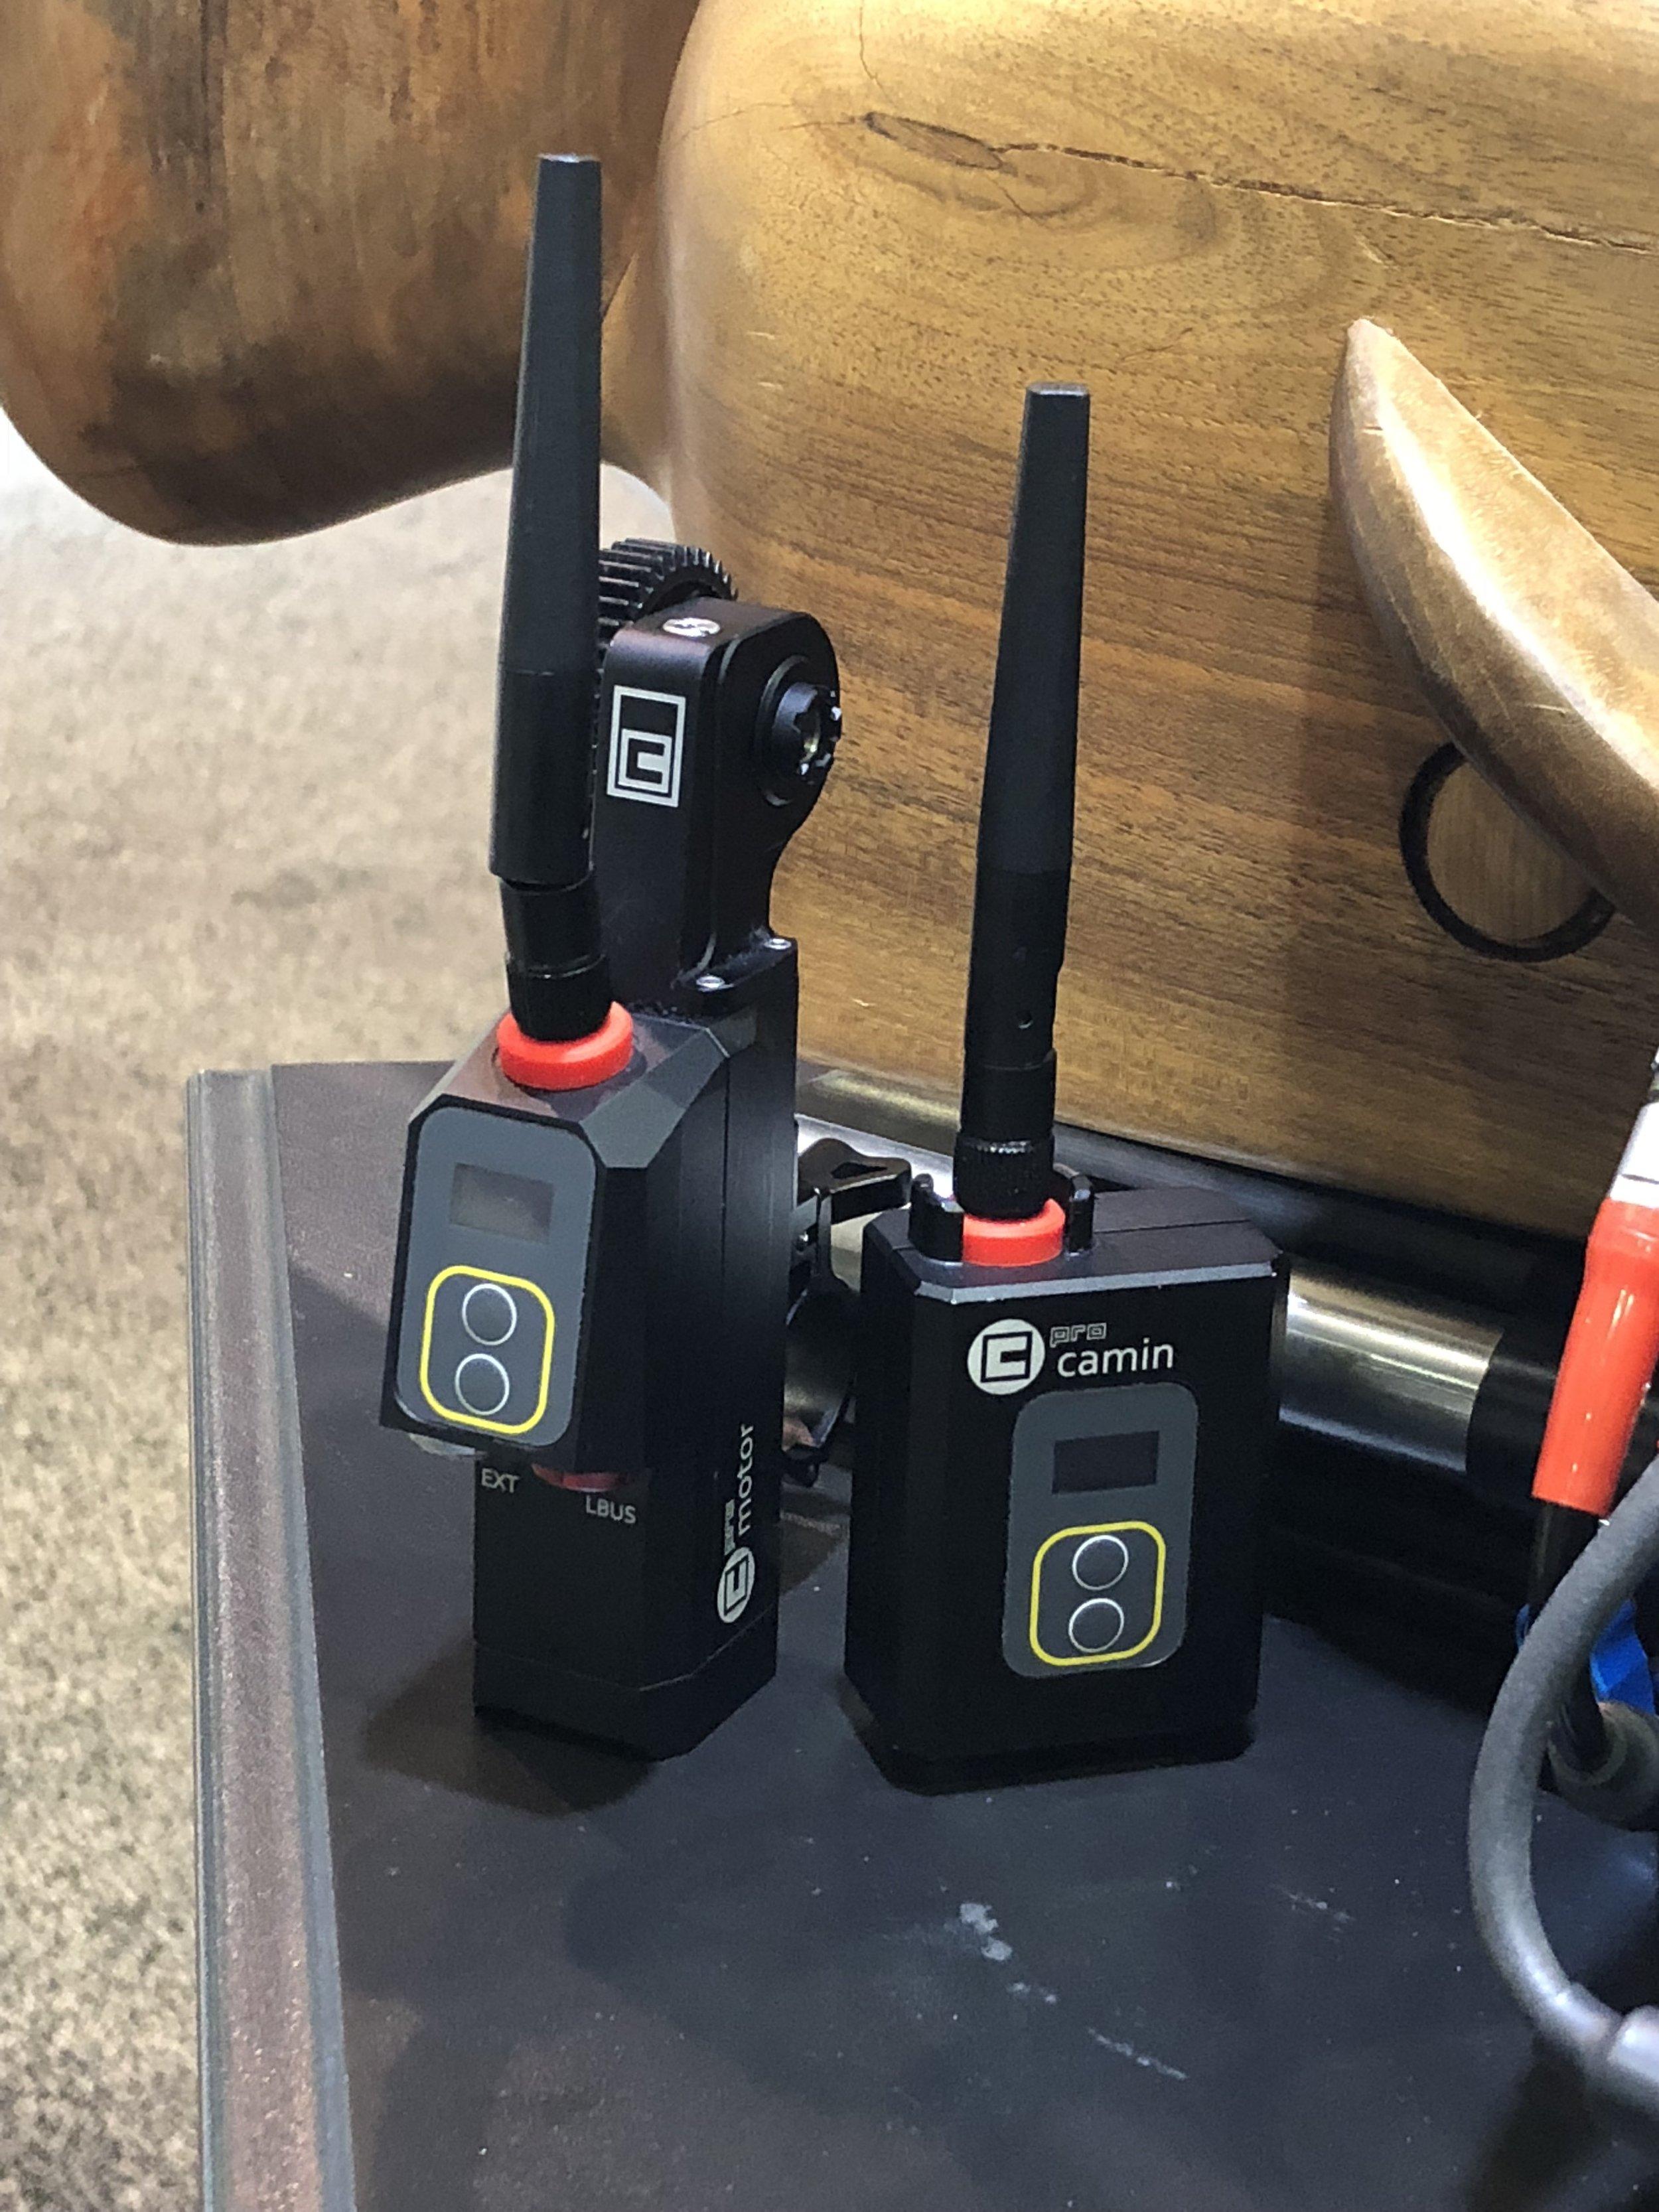 CMotion's new wireless kit, Camin